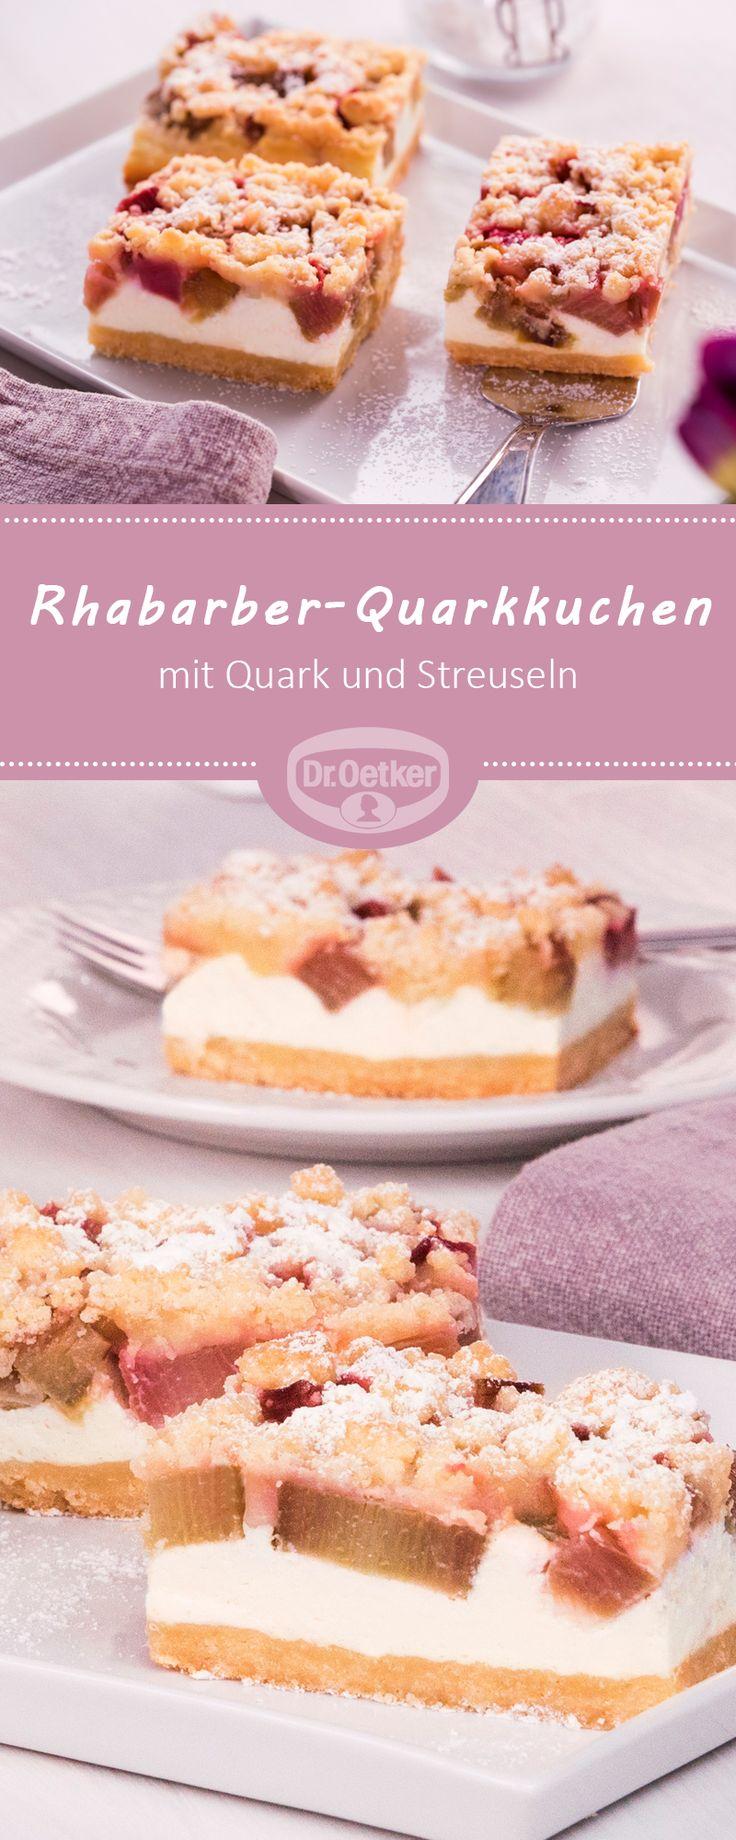 Rhabarber-Quarkkuchen: Rhabarber ist gut, Rhabarber mit Quark noch besser und Rhabarber mit Quark und Streuseln am besten #rhabarber #kuchen #quark